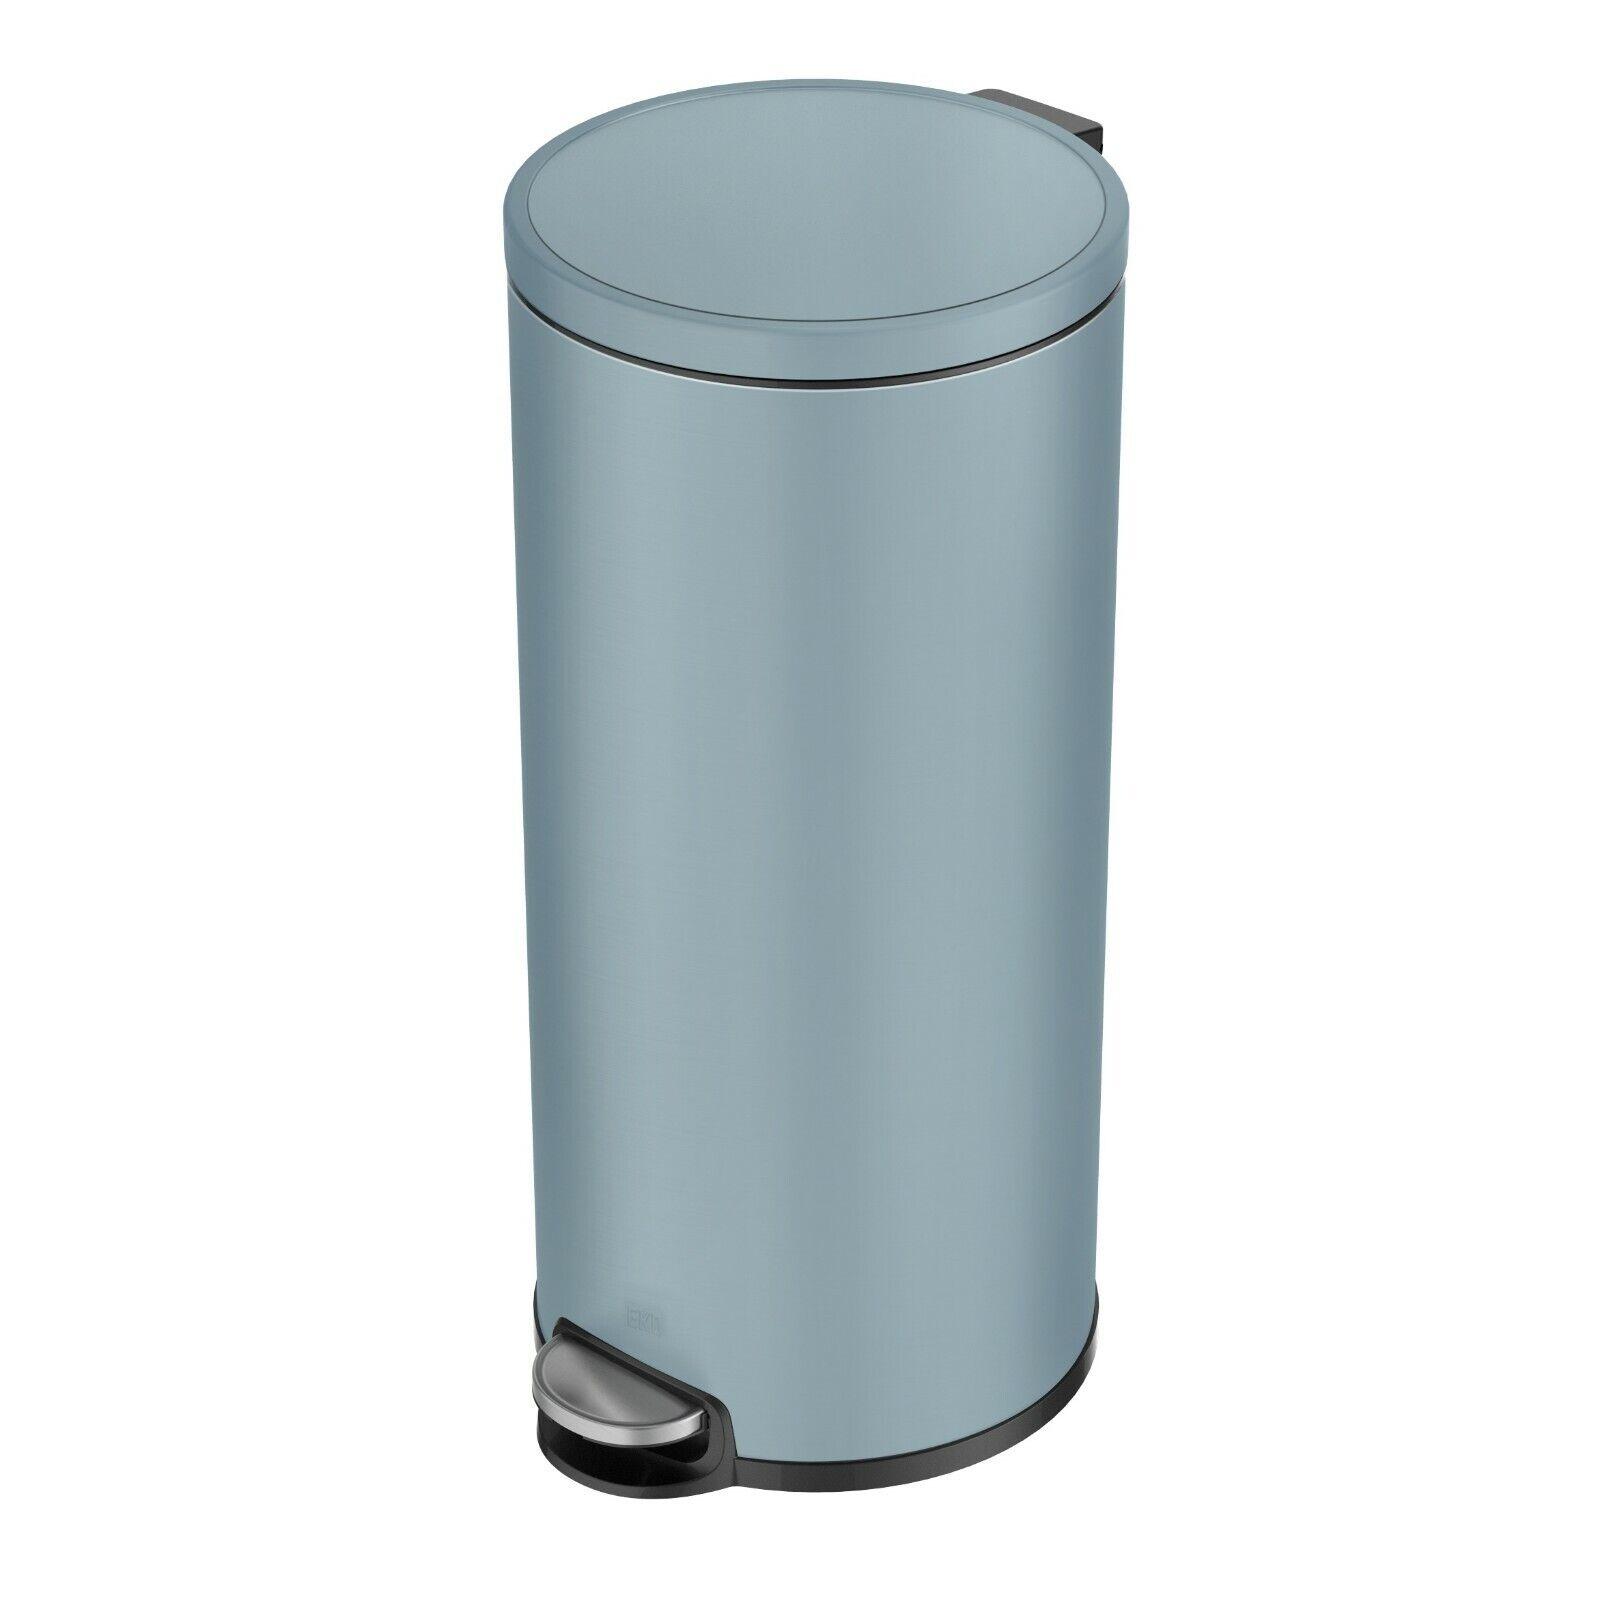 EKO EVA Blau KITCHEN PEDAL BIN 30L STAINLESS STEEL Removable Bucket Easy Clean